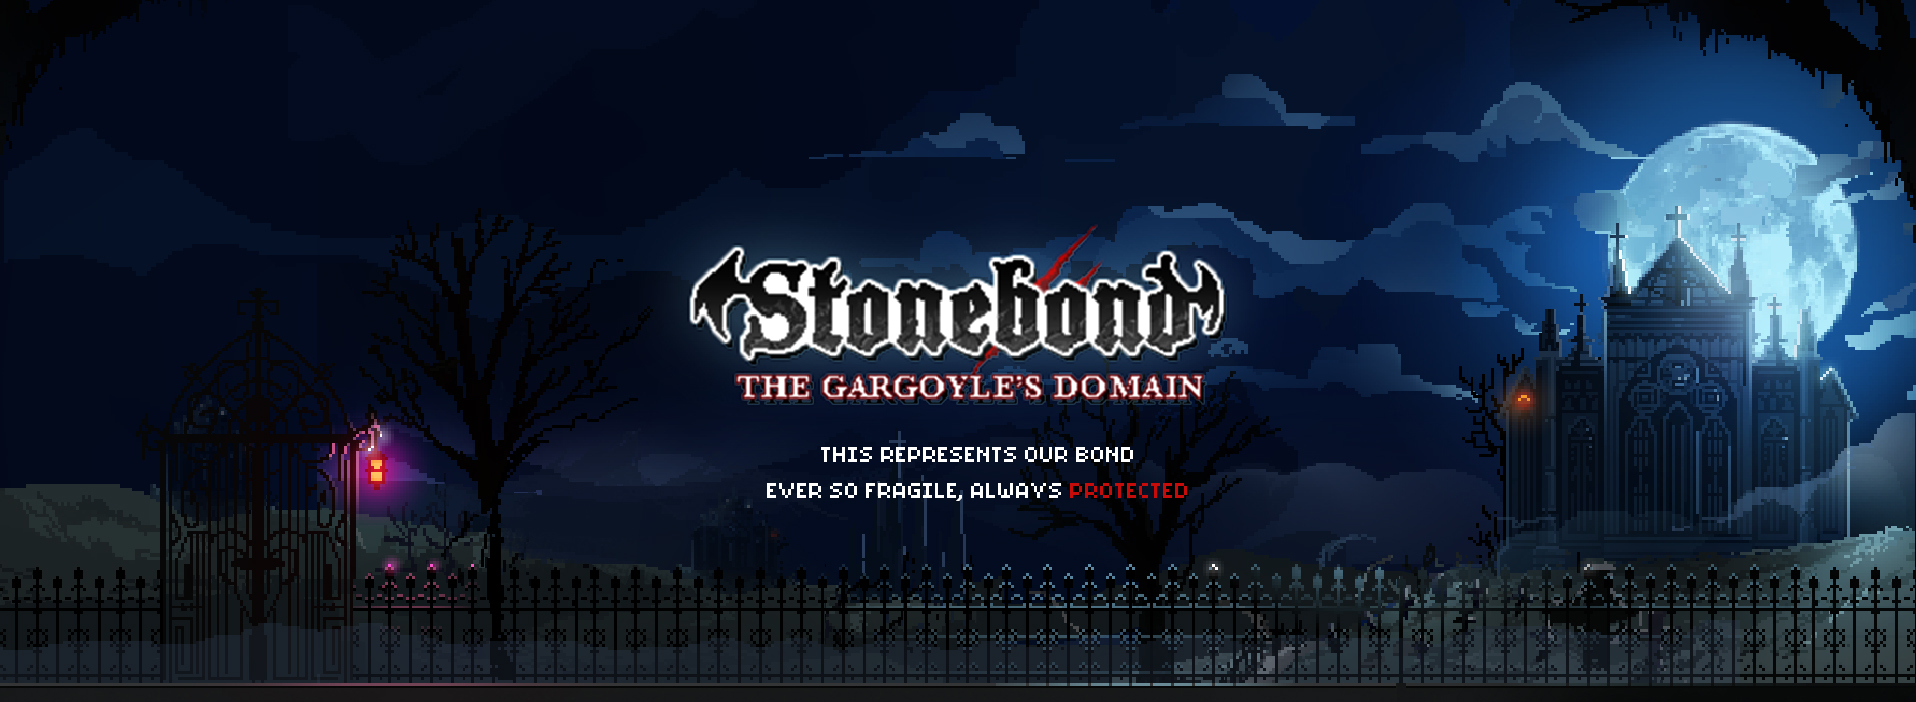 Stonebond: The Gargoyle's Domain